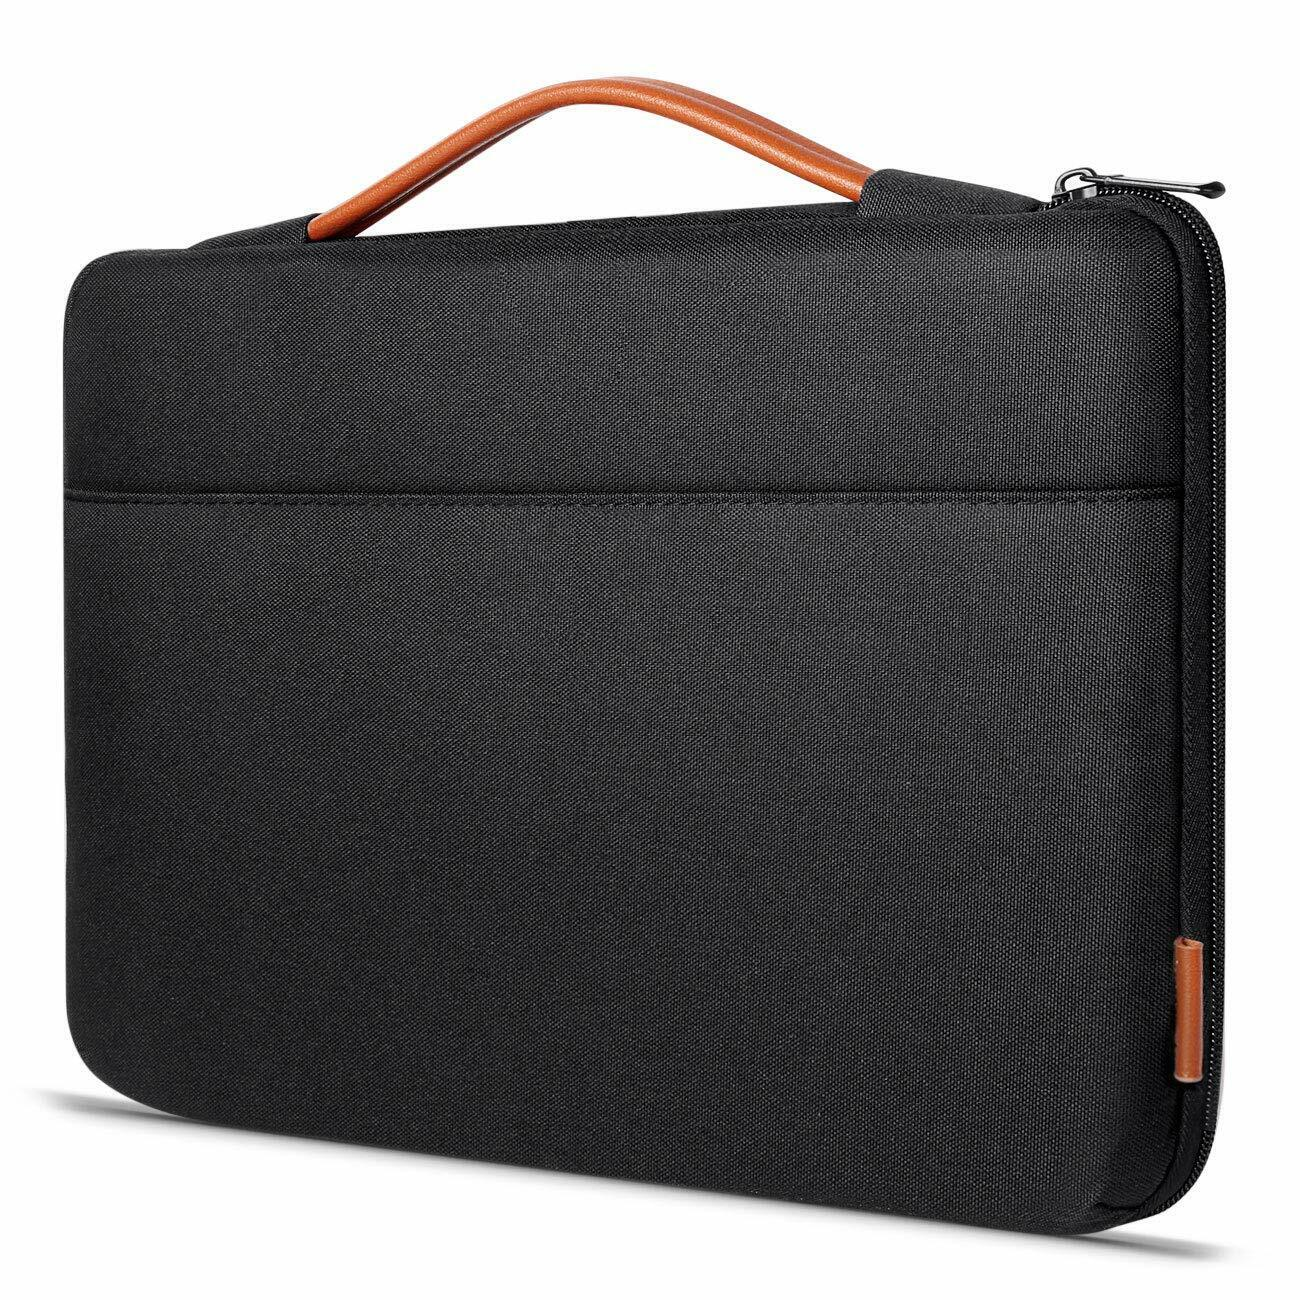 15~15,6 Zoll Laptotasche Stoßfestes Spritzwasserfest Notebooktasche Laptophülle